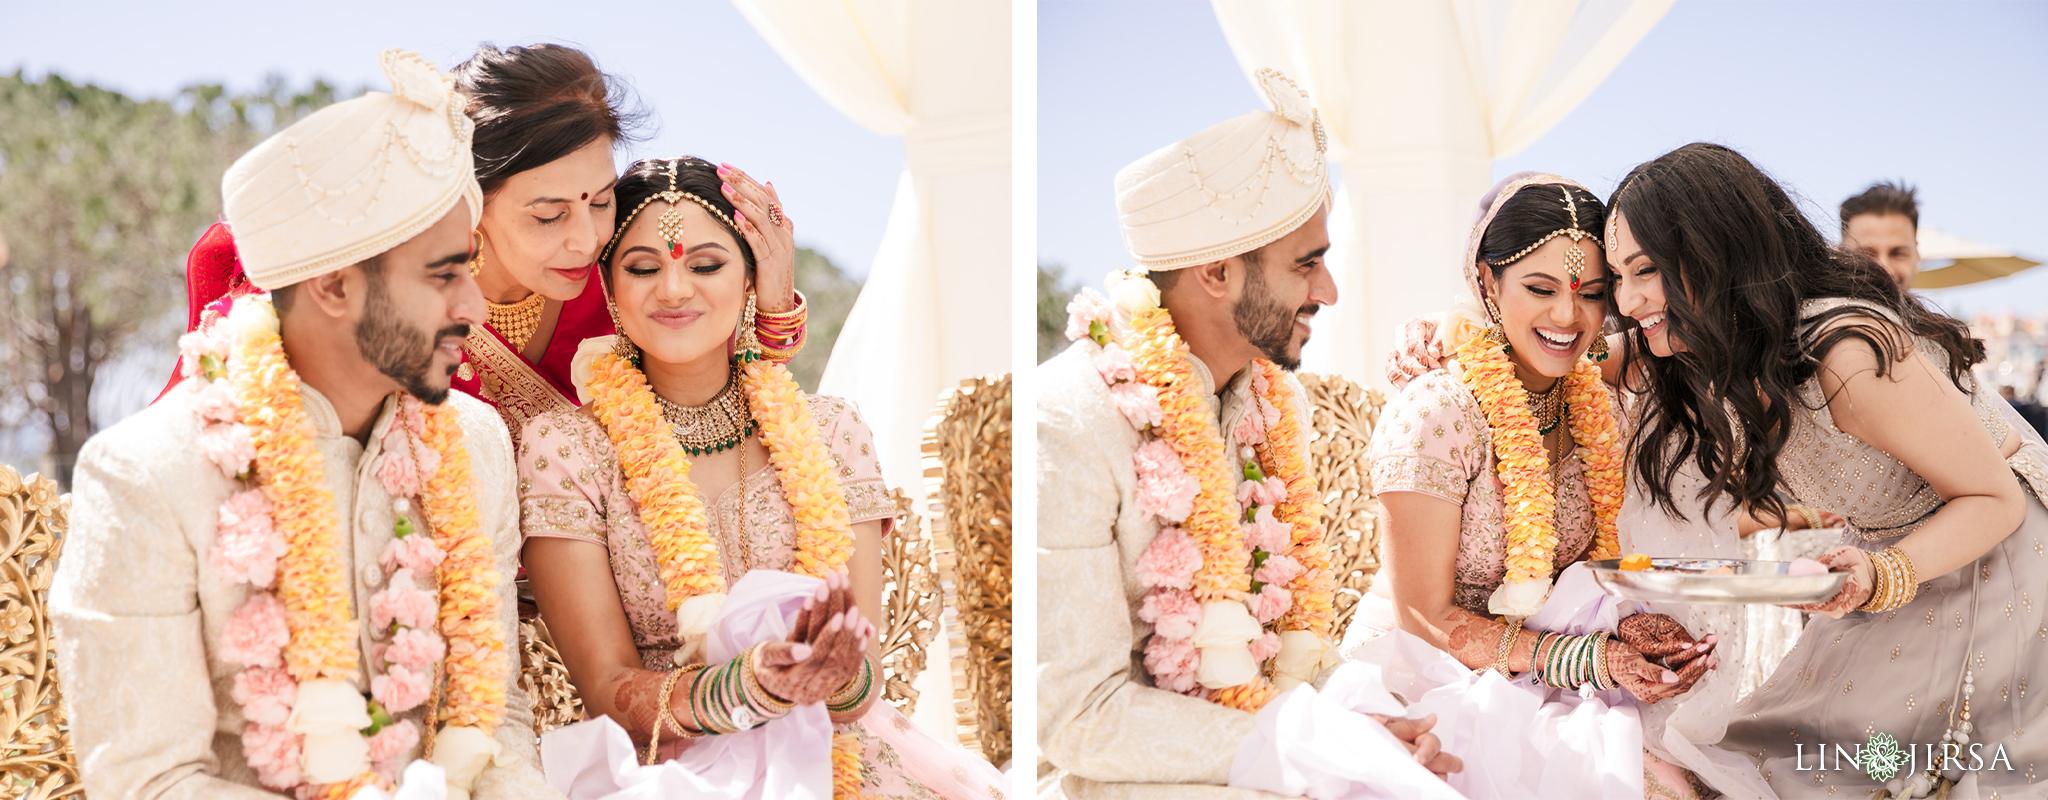 33 Laguna Cliffs Marriott Indian Wedding Photography